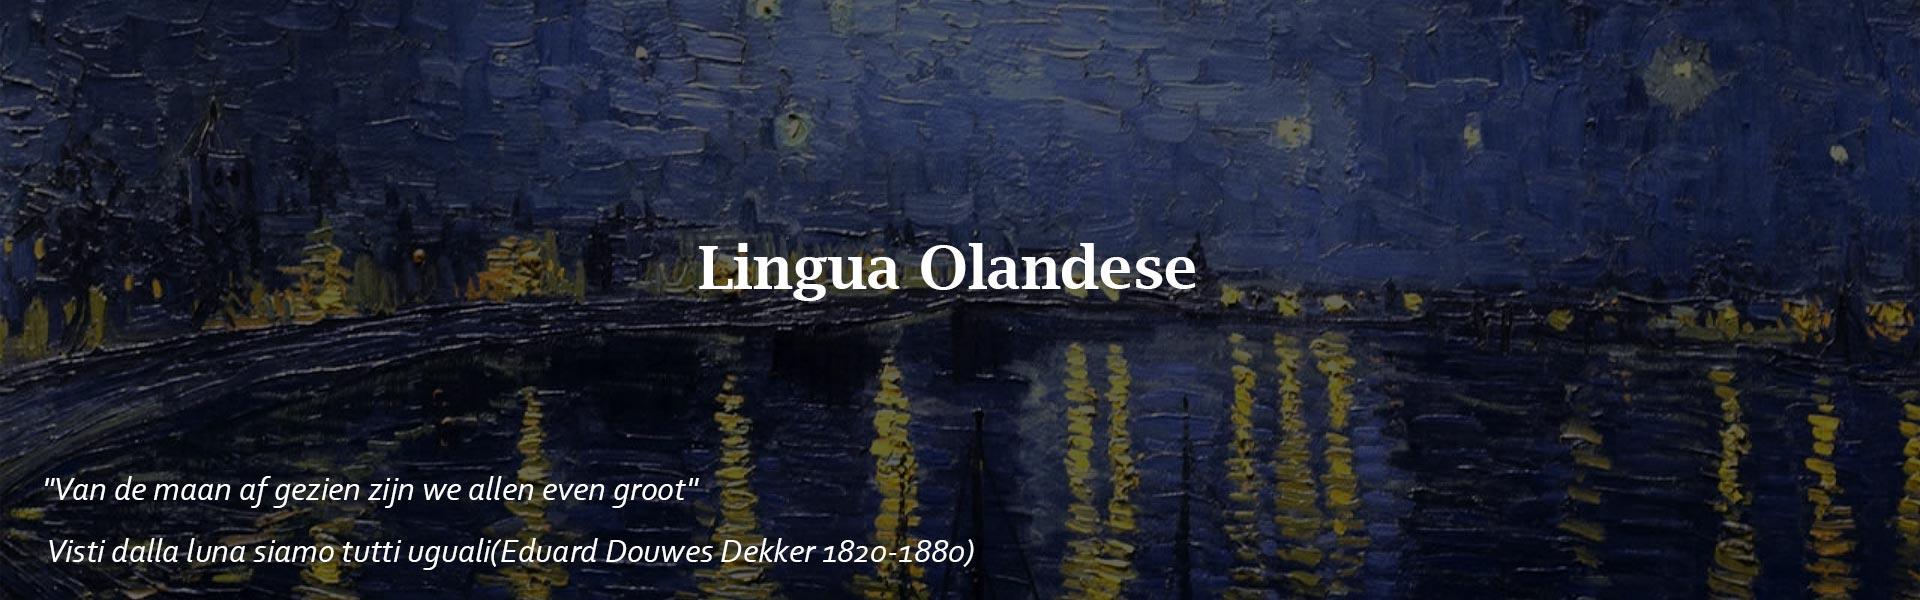 lingua-Olandese-Alif